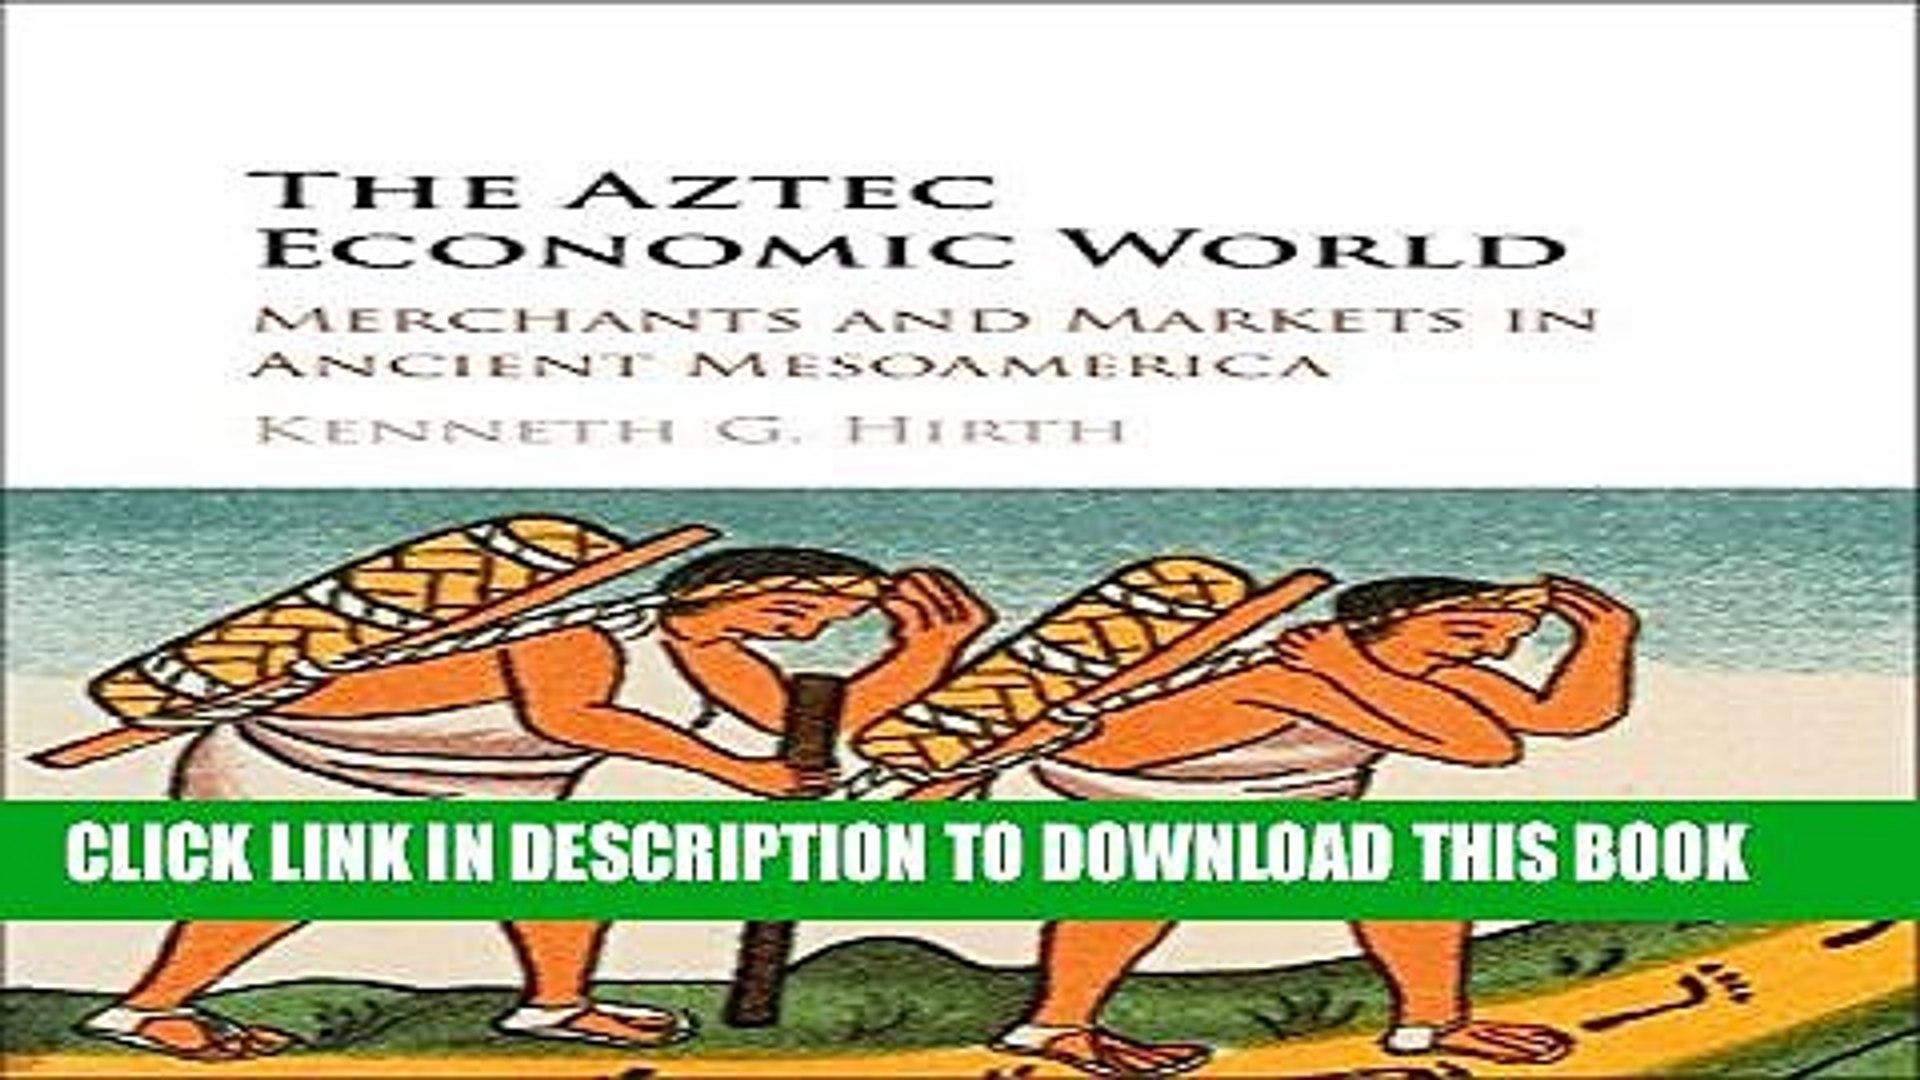 [PDF] The Aztec Economic World: Merchants and Markets in Ancient Mesoamerica Popular Online